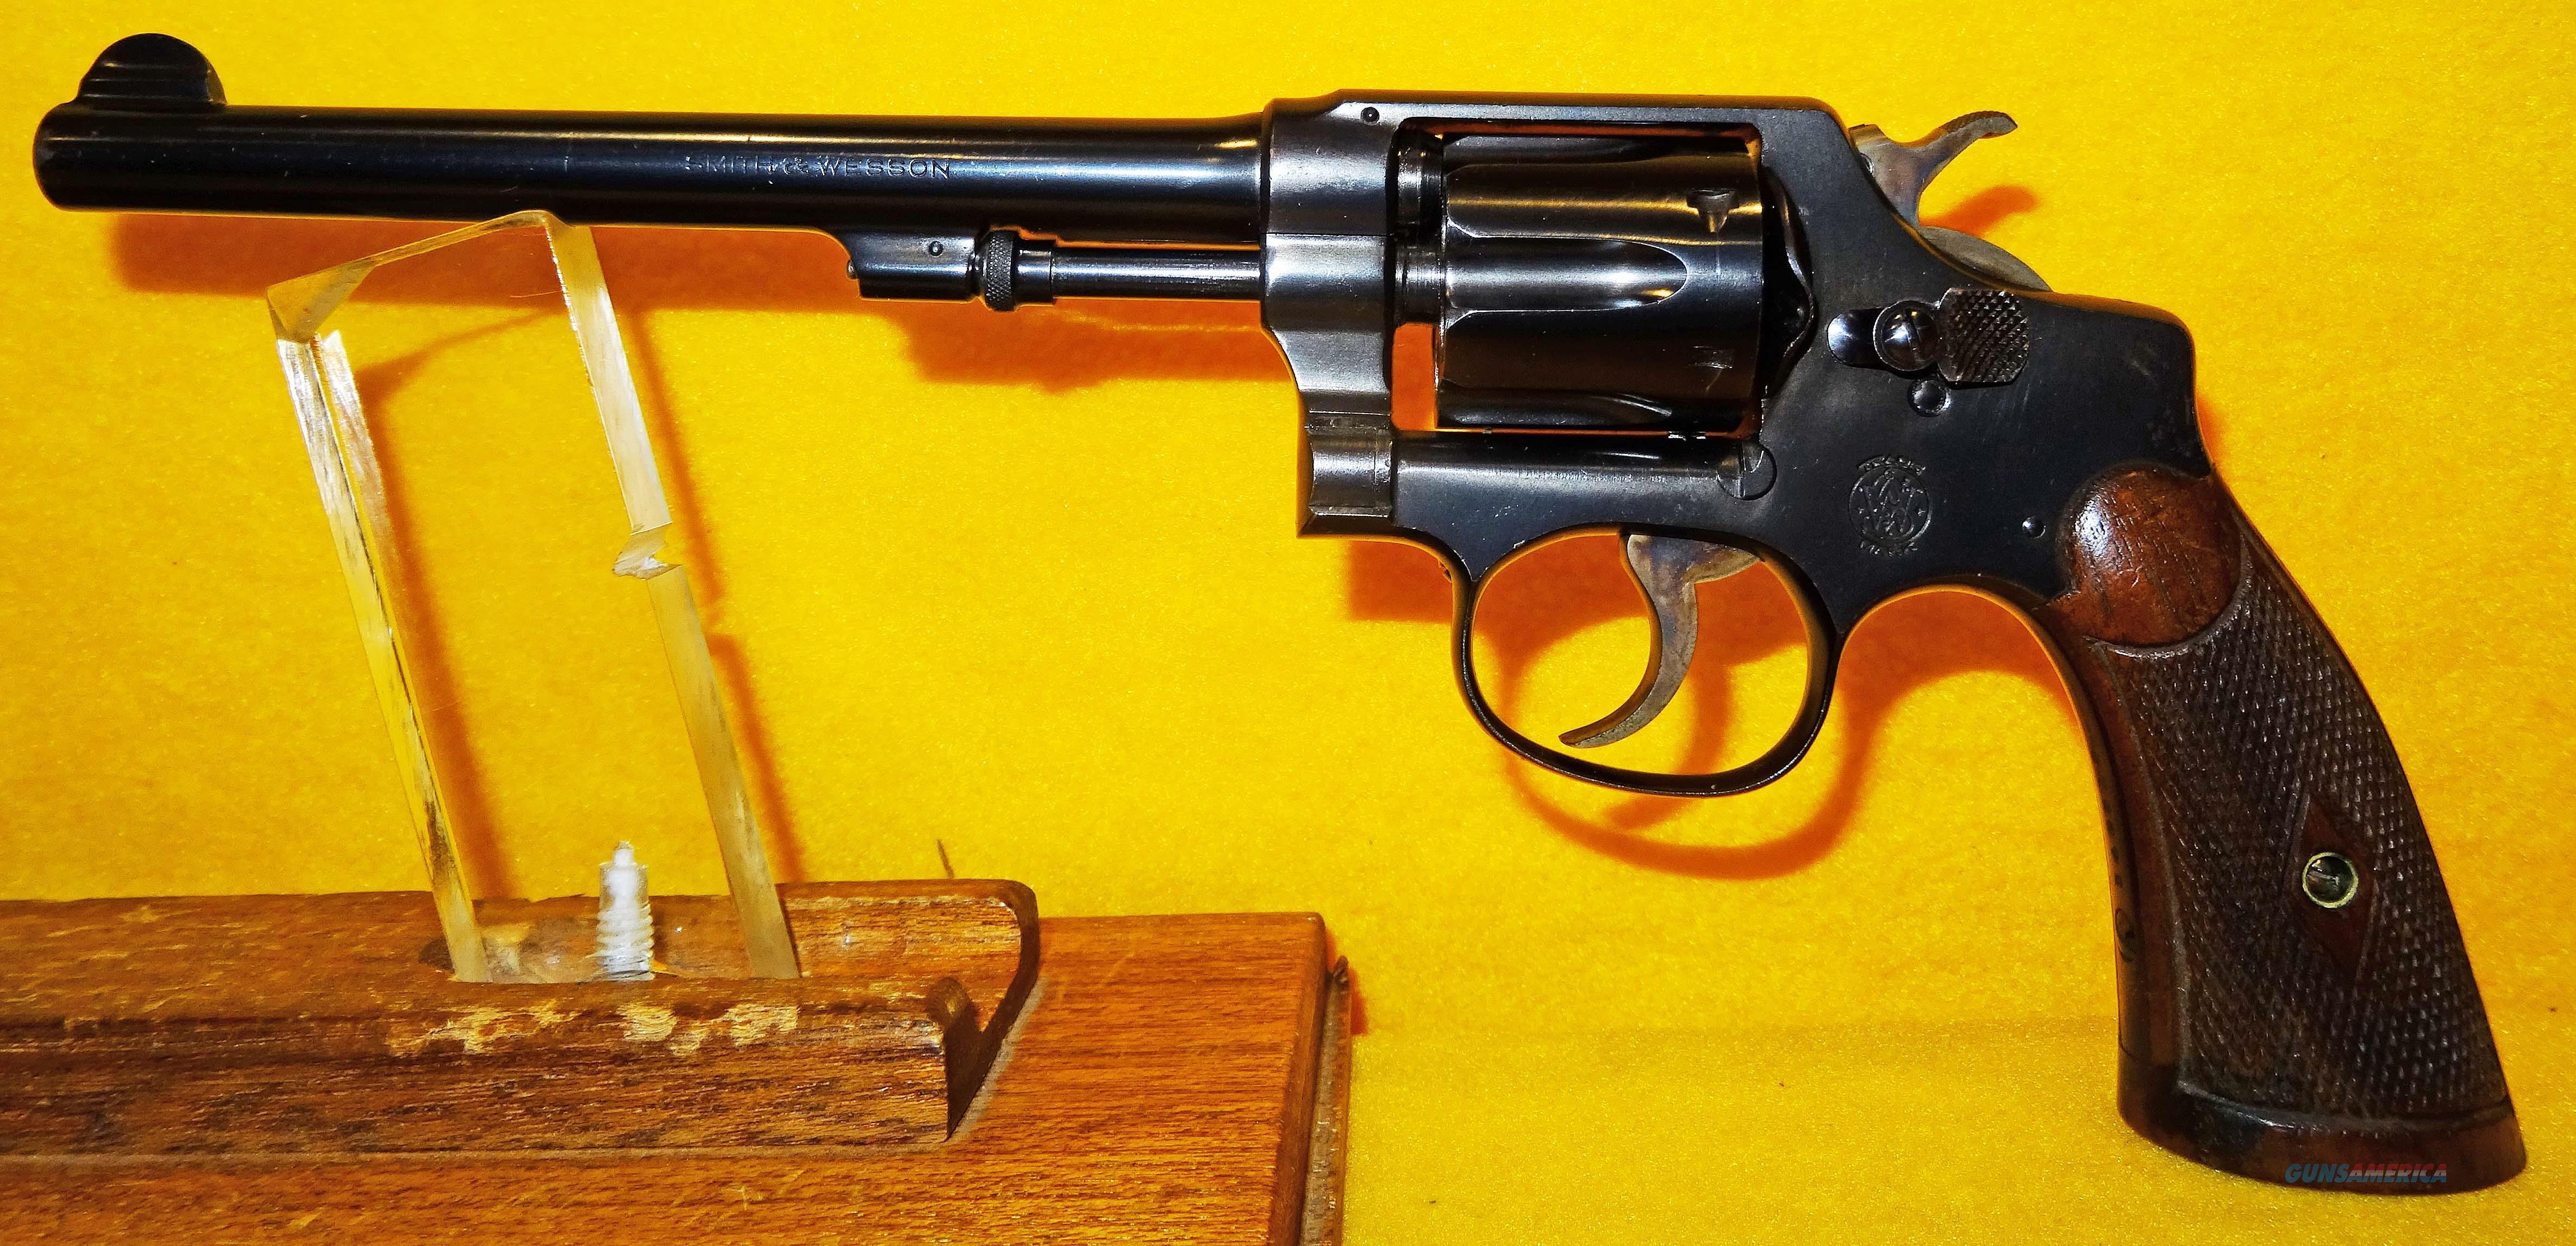 S&W .32 REGULATION POLICE PRE WAR  Guns > Pistols > Smith & Wesson Revolvers > Pre-1945